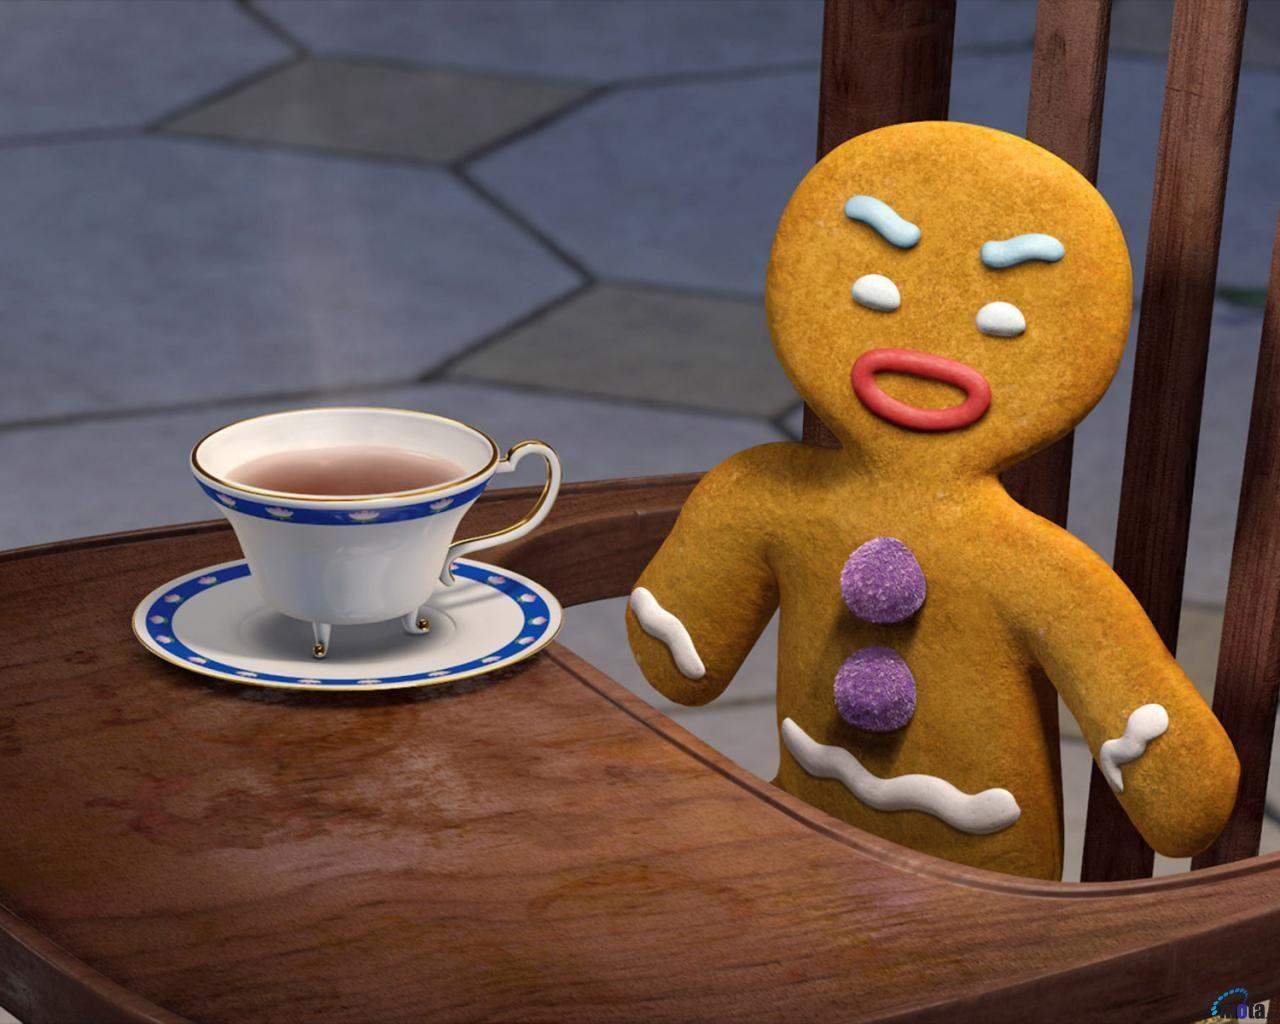 Pin by Caro GB on Películas Pinterest Gingerbread